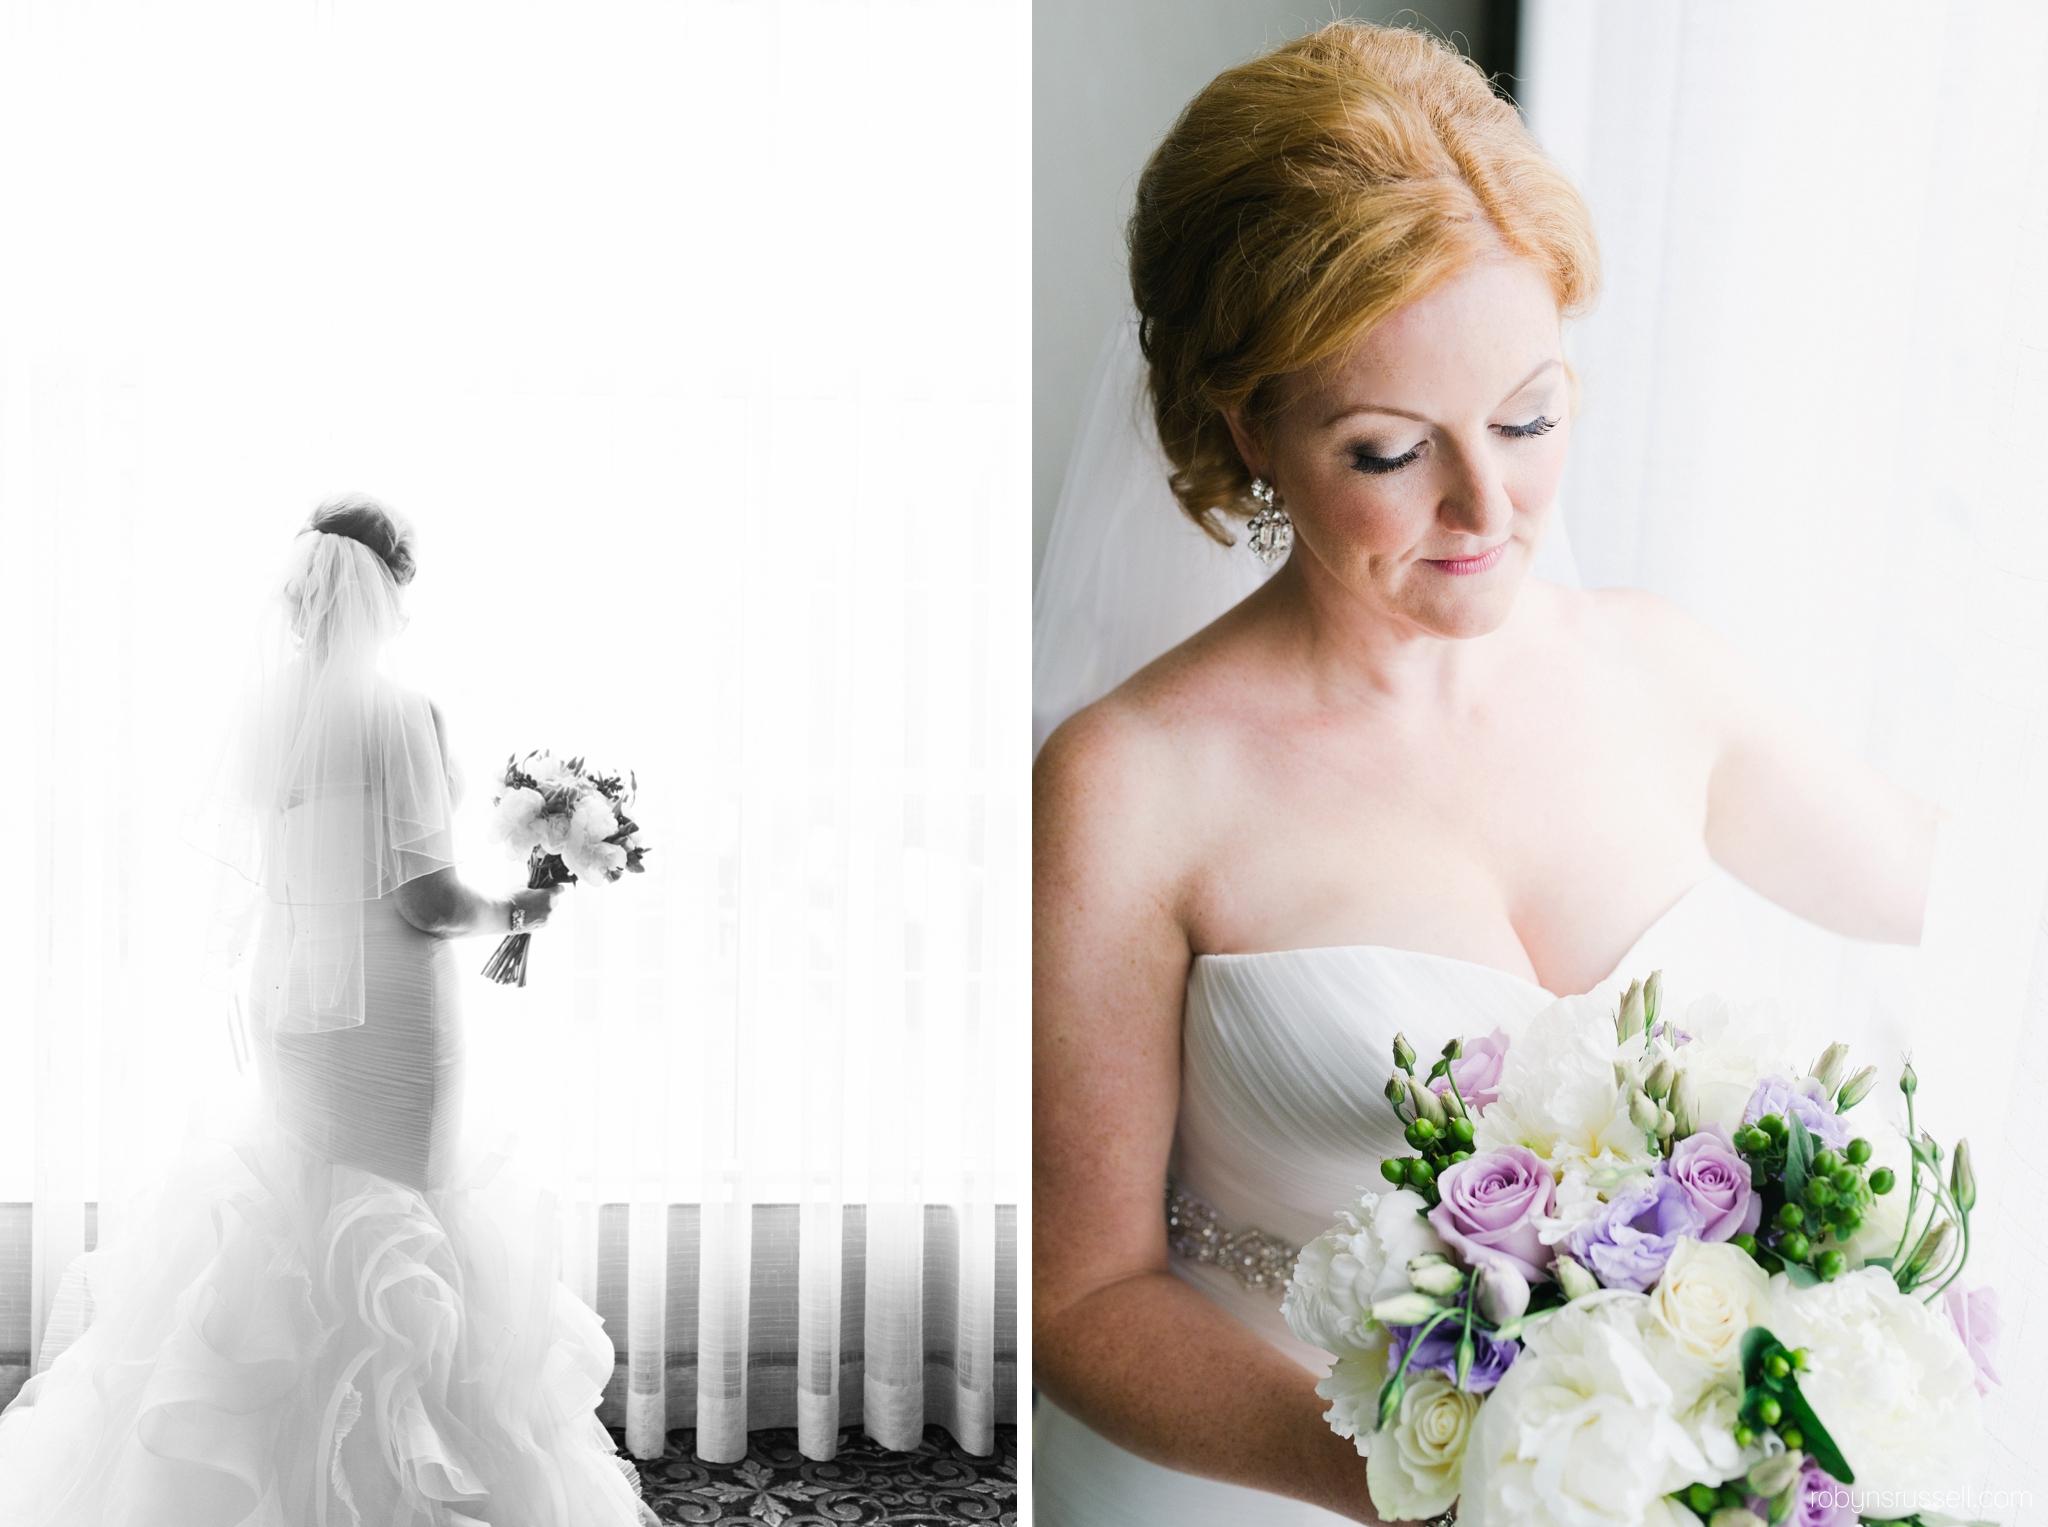 10-beautiful-bride-by-windows-oakville-hotel-oakville-hotel-staybridge-suites.jpg